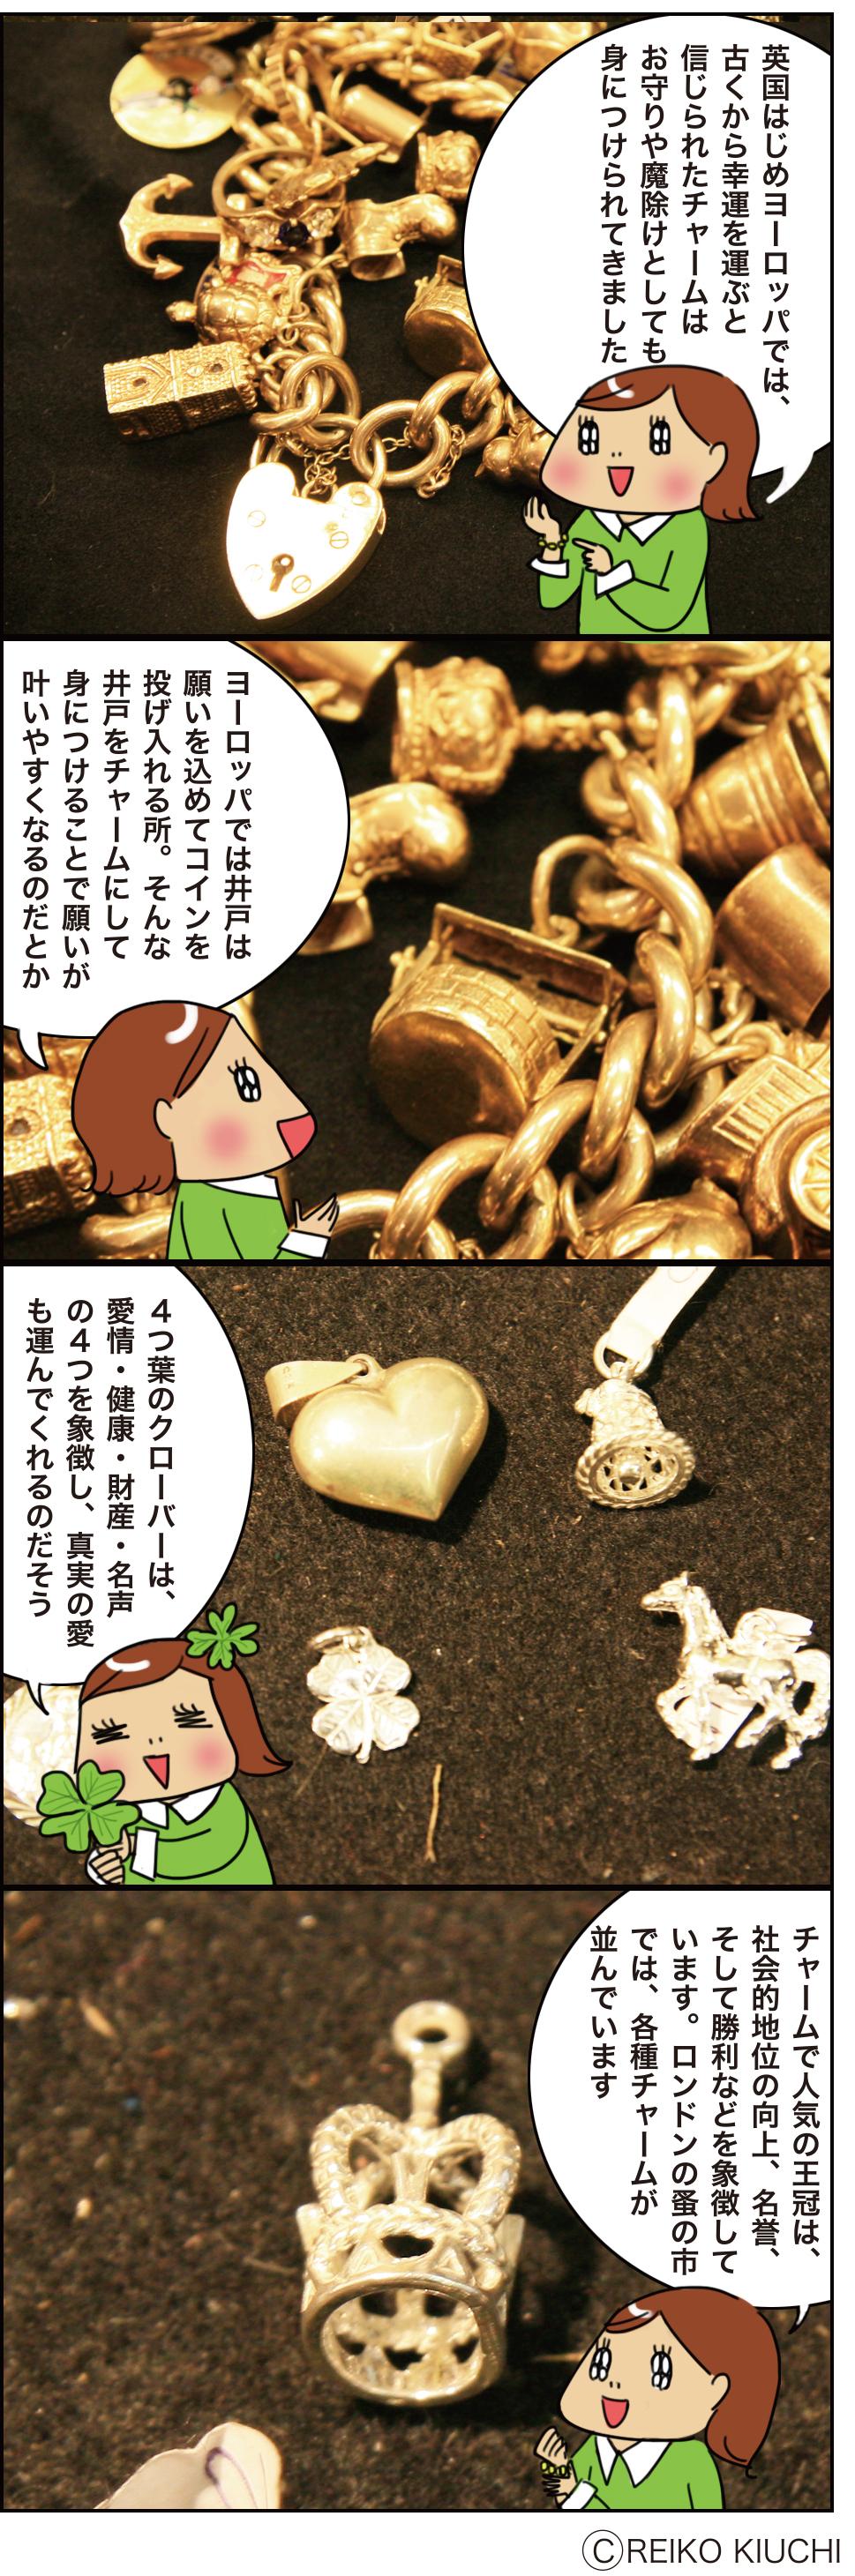 Spiritual漫画201605向締切